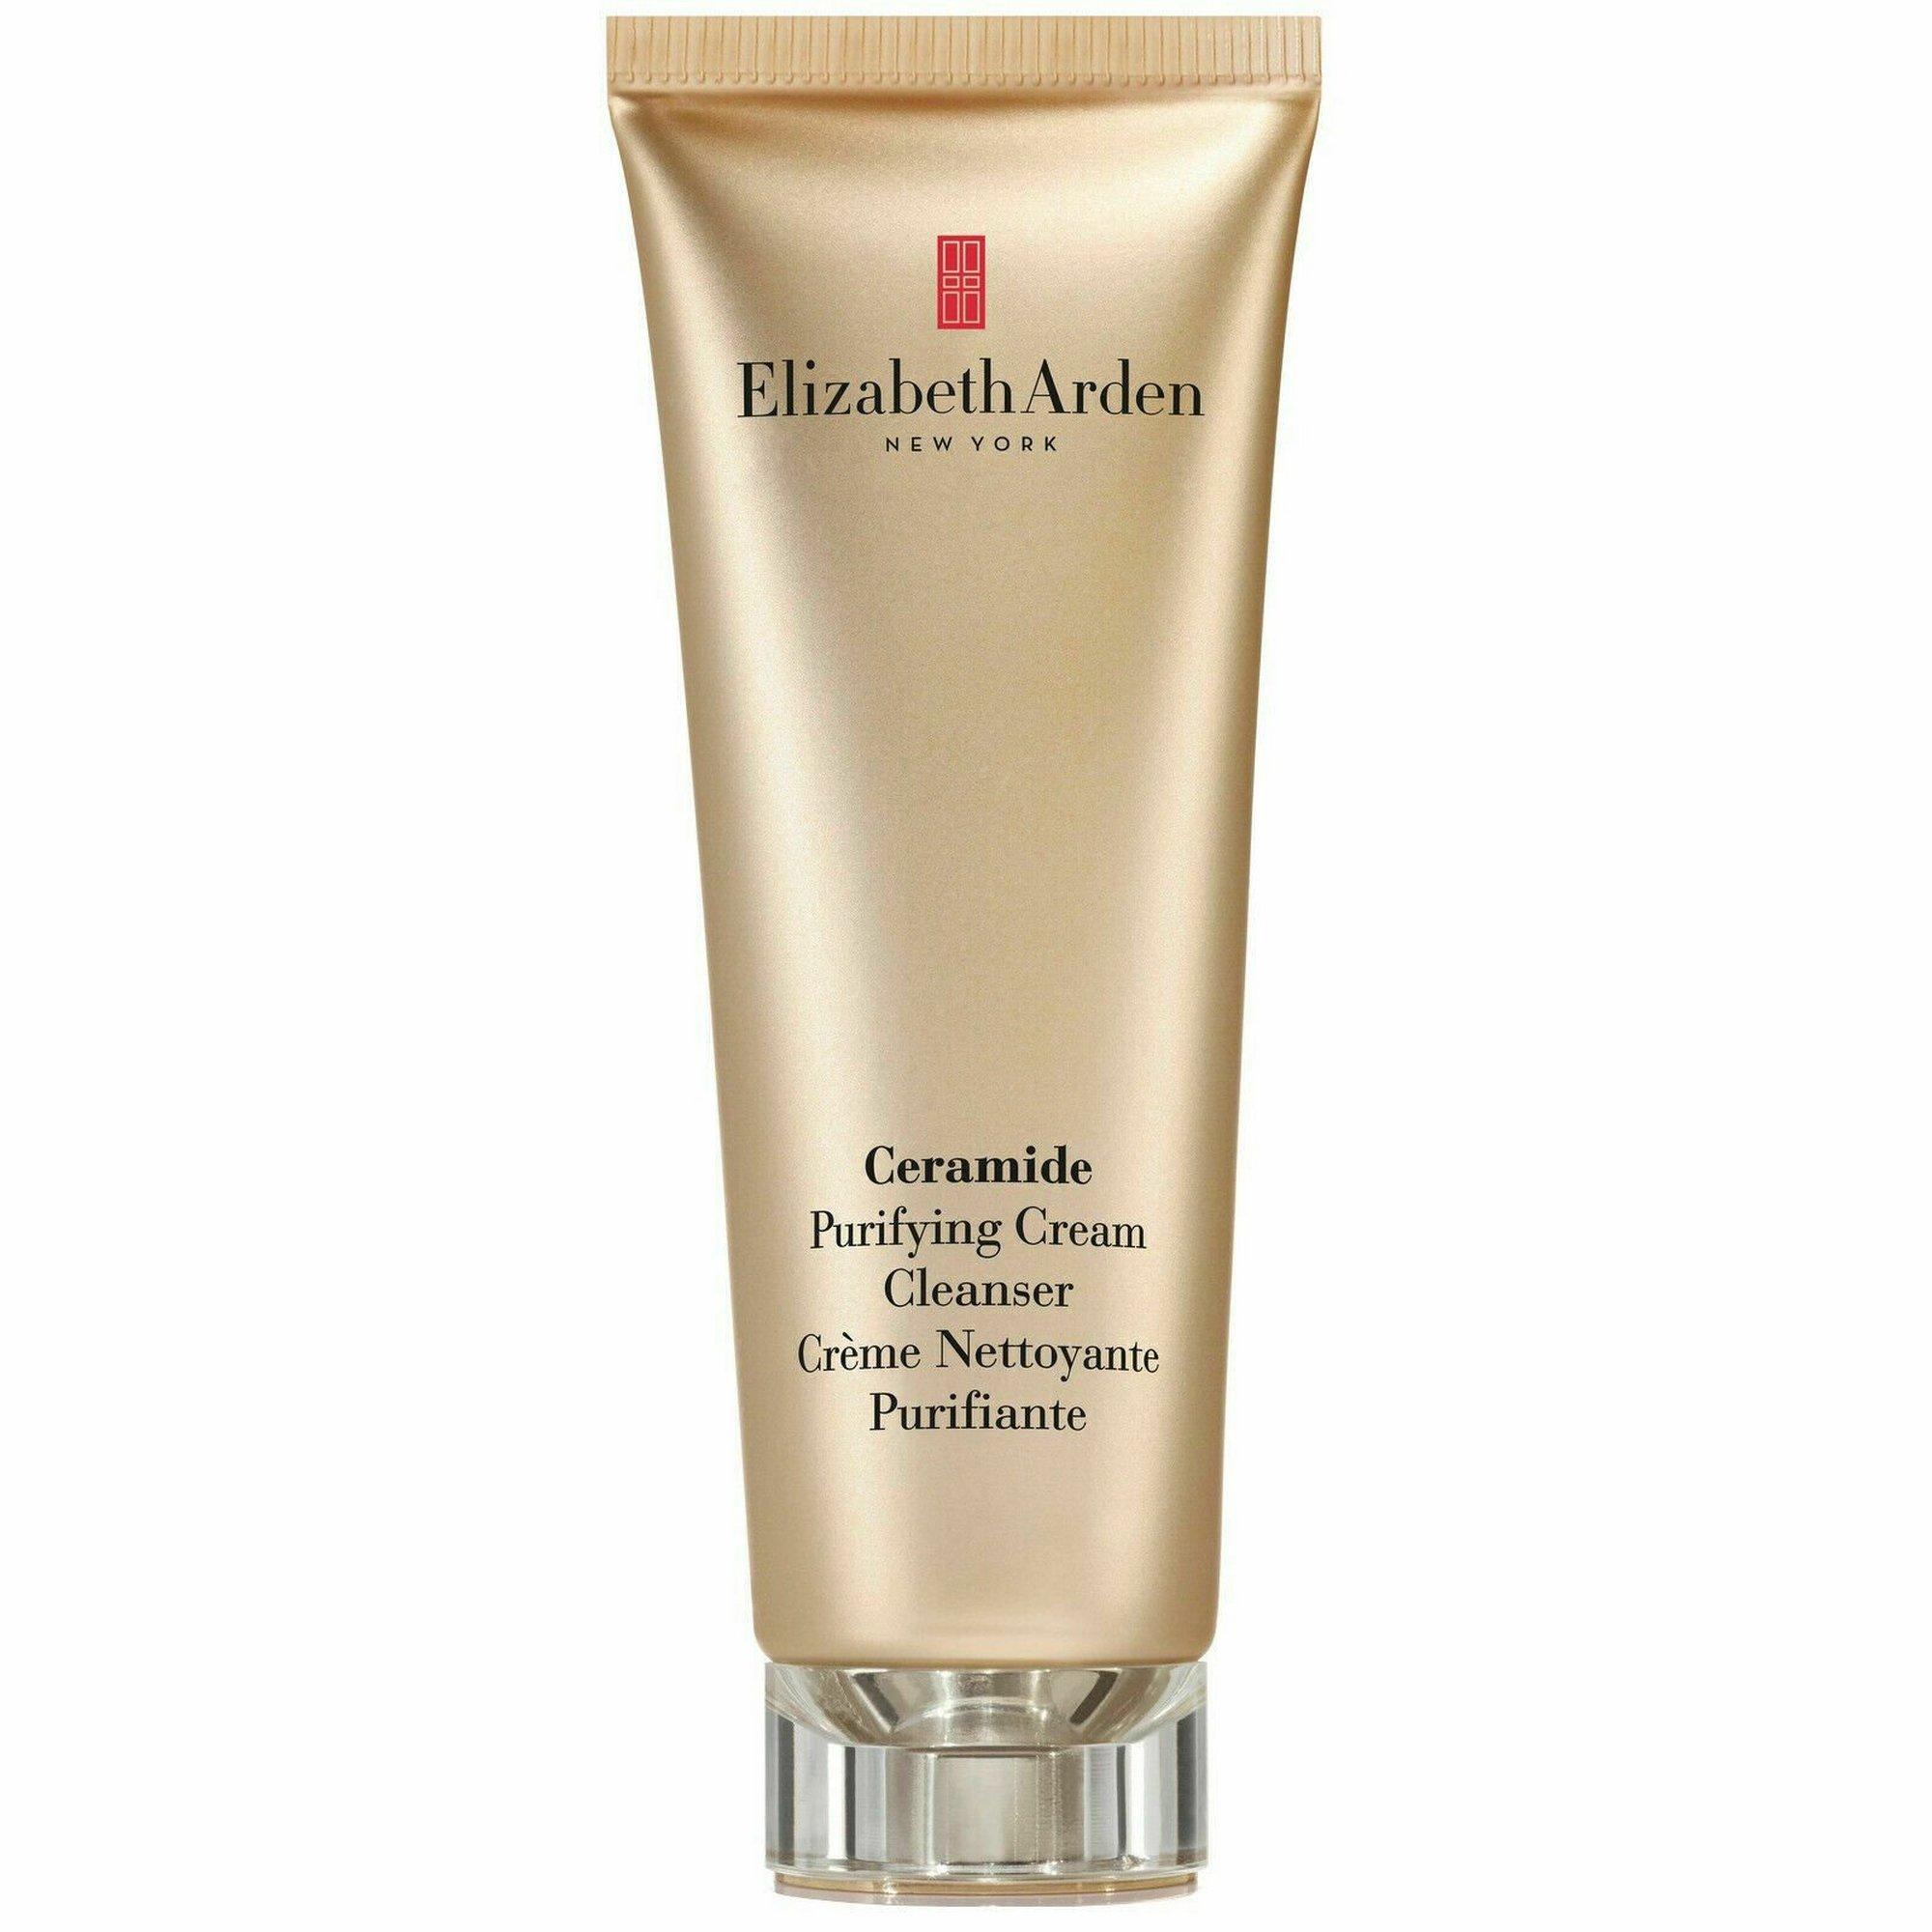 Image of Elizabeth Arden Ceramide Purifying Cream 125ml